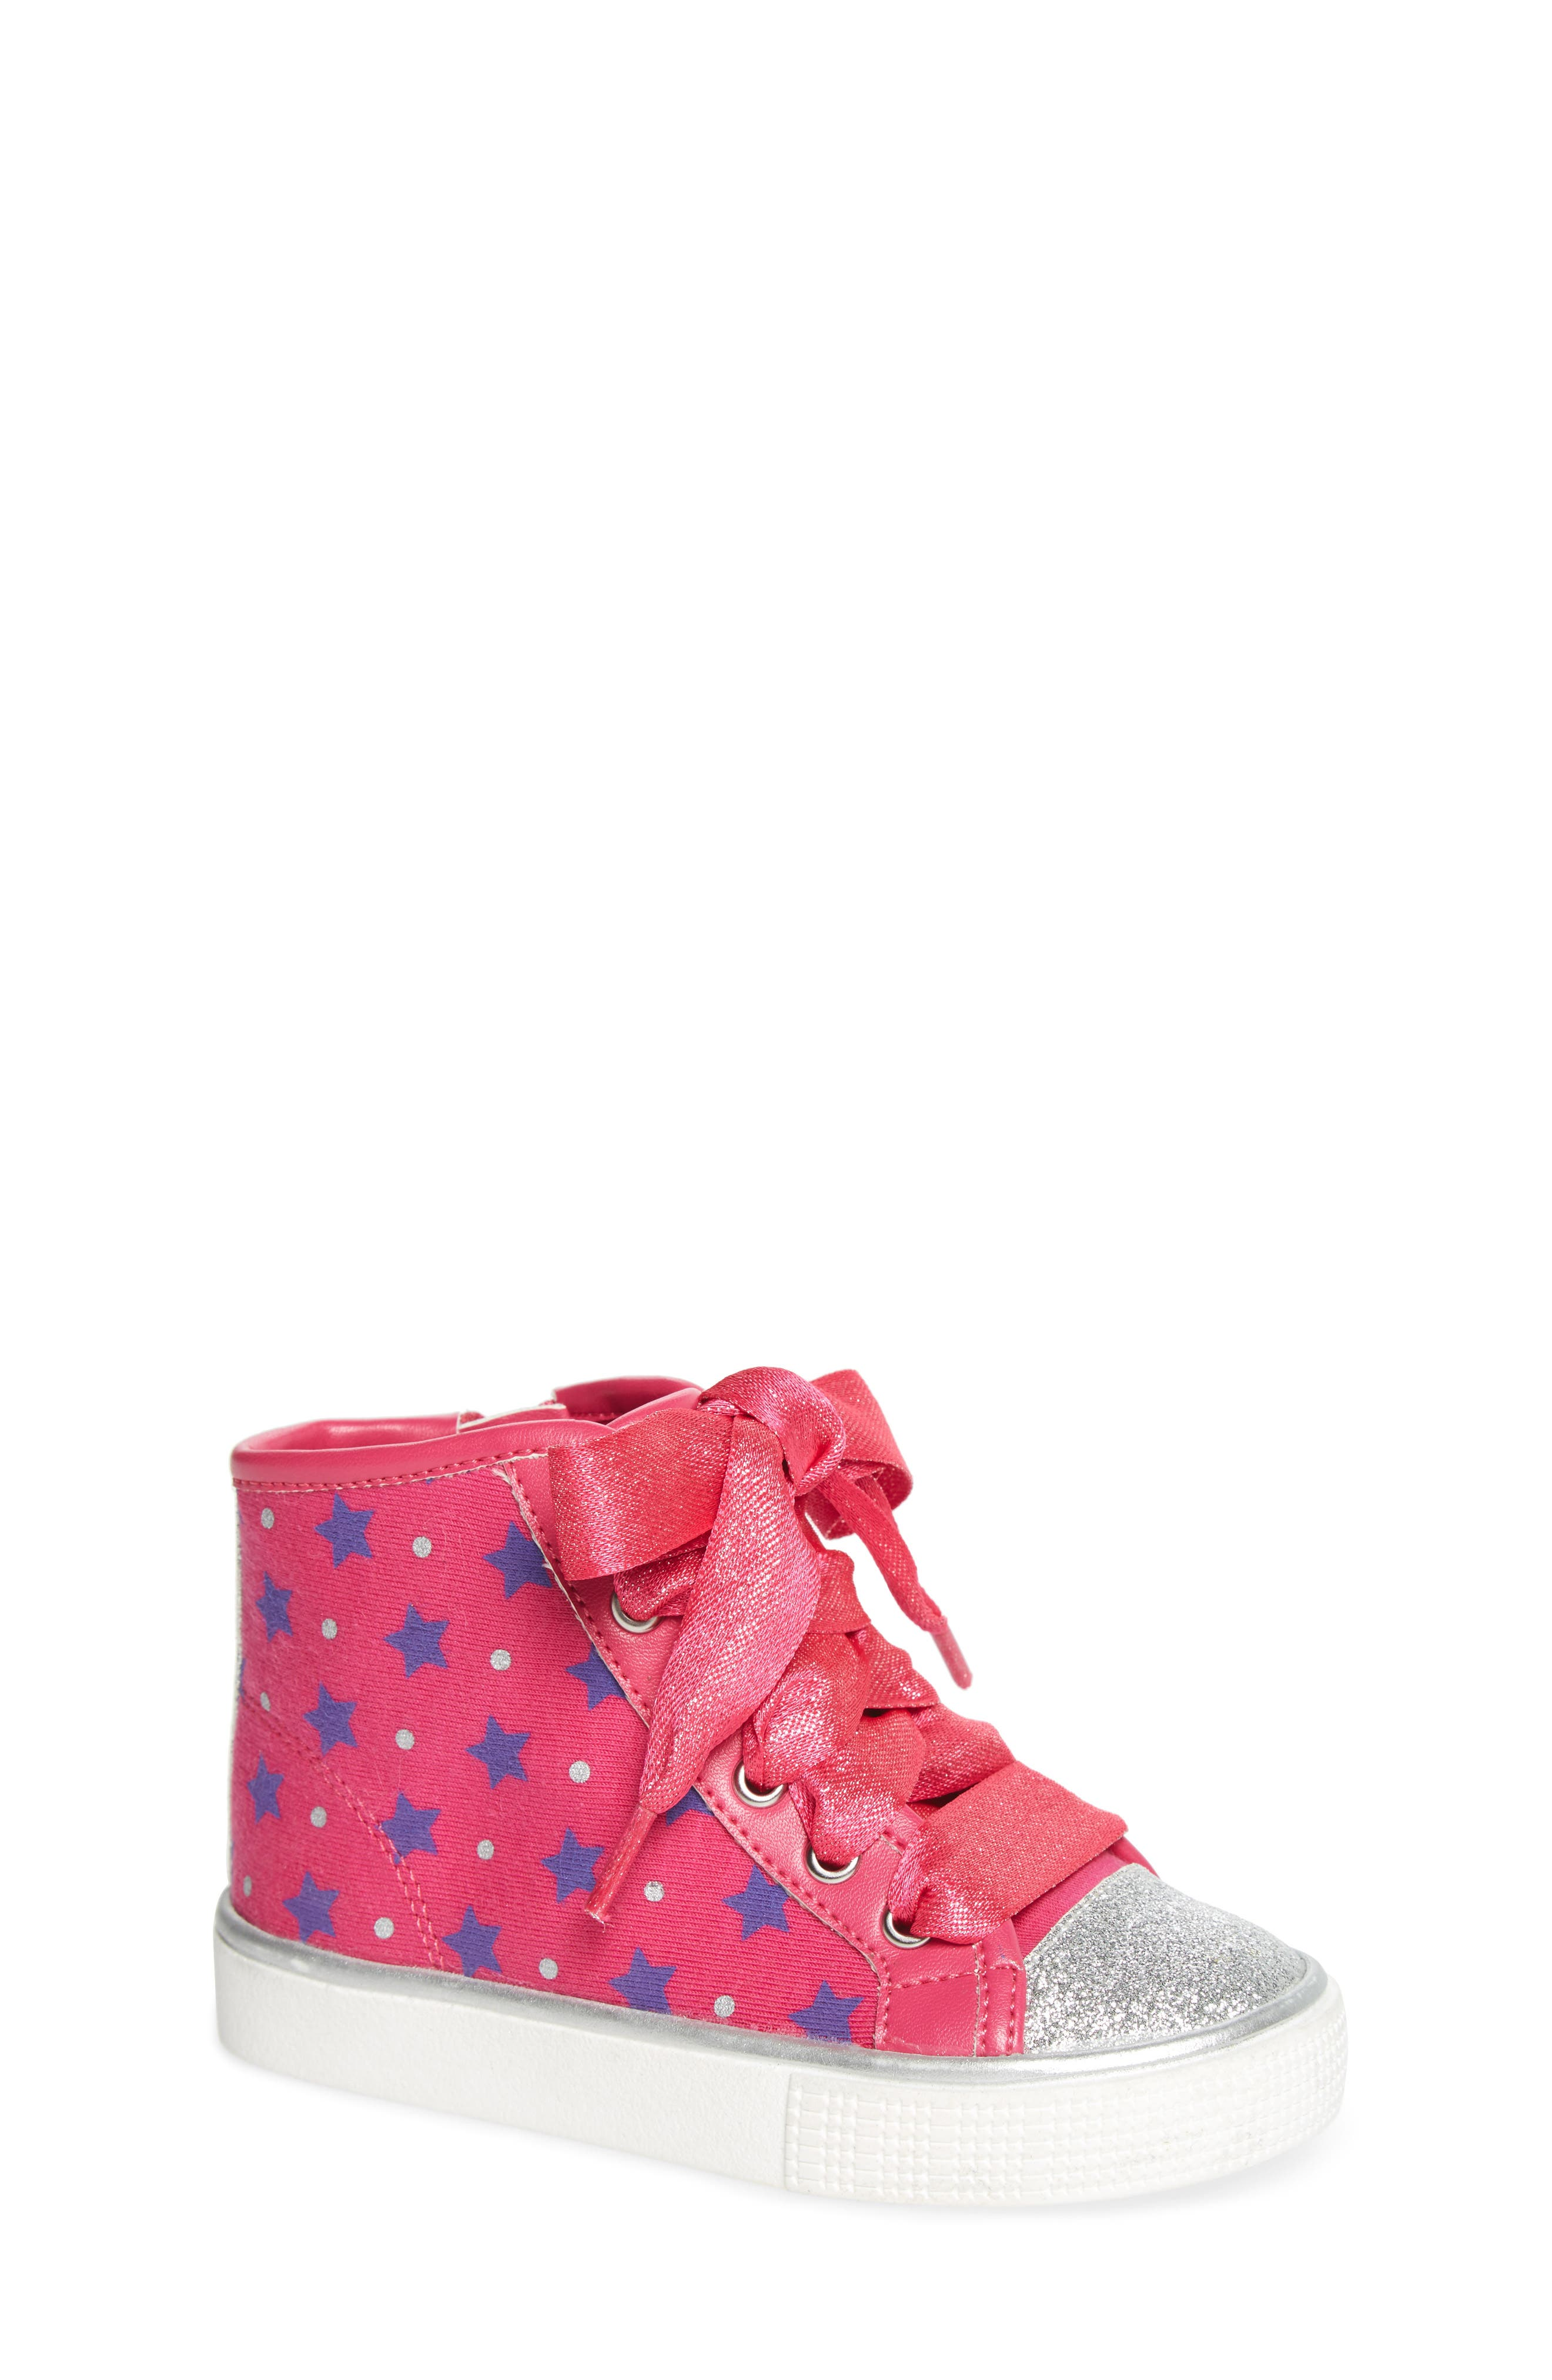 Emerson High Top Sneaker,                             Main thumbnail 1, color,                             Pink/ Purple